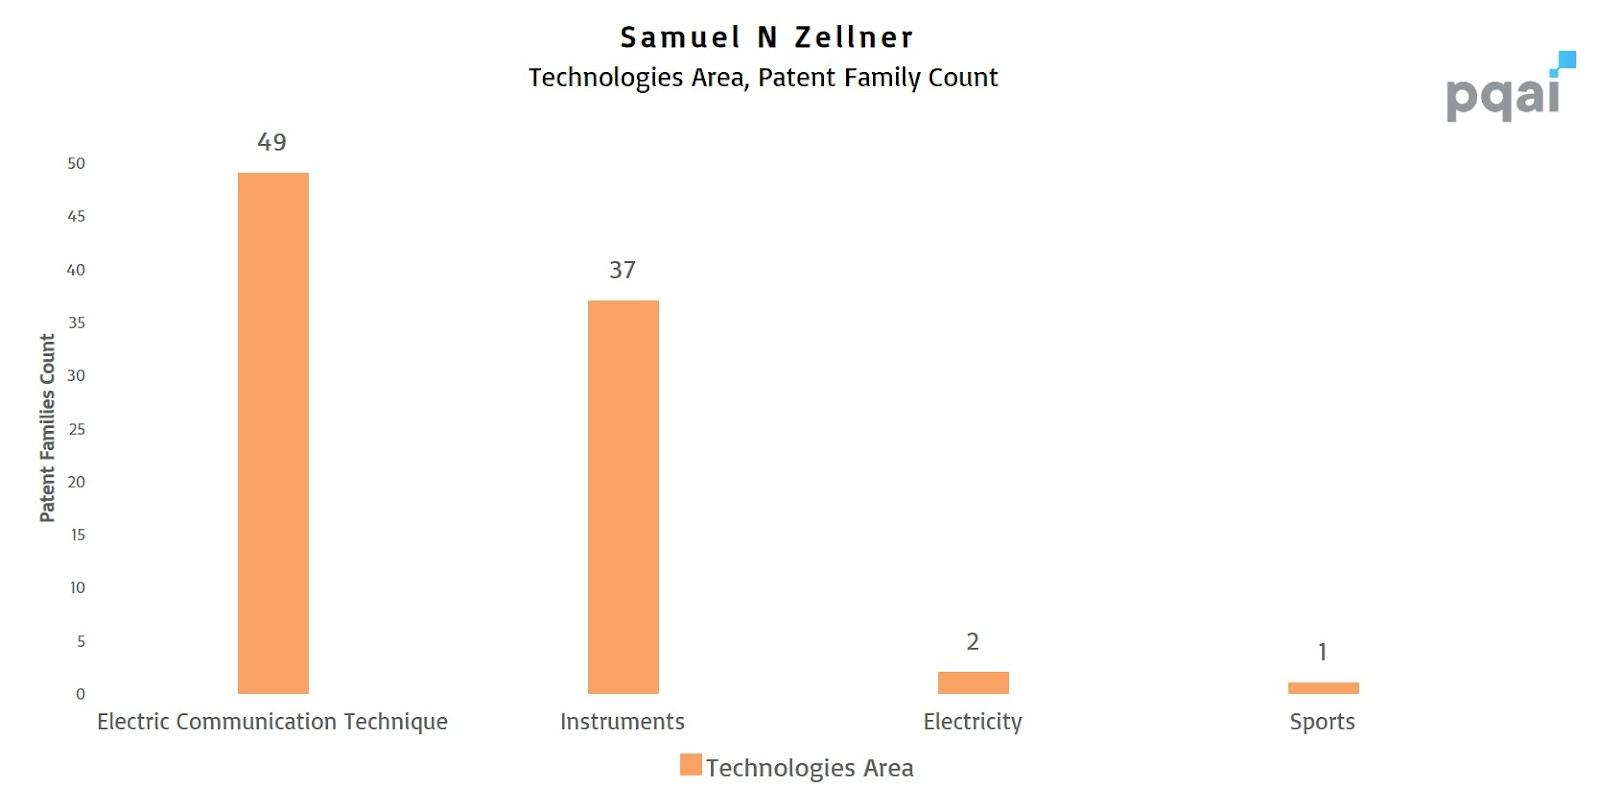 Sam Zellner Patent Portfolio